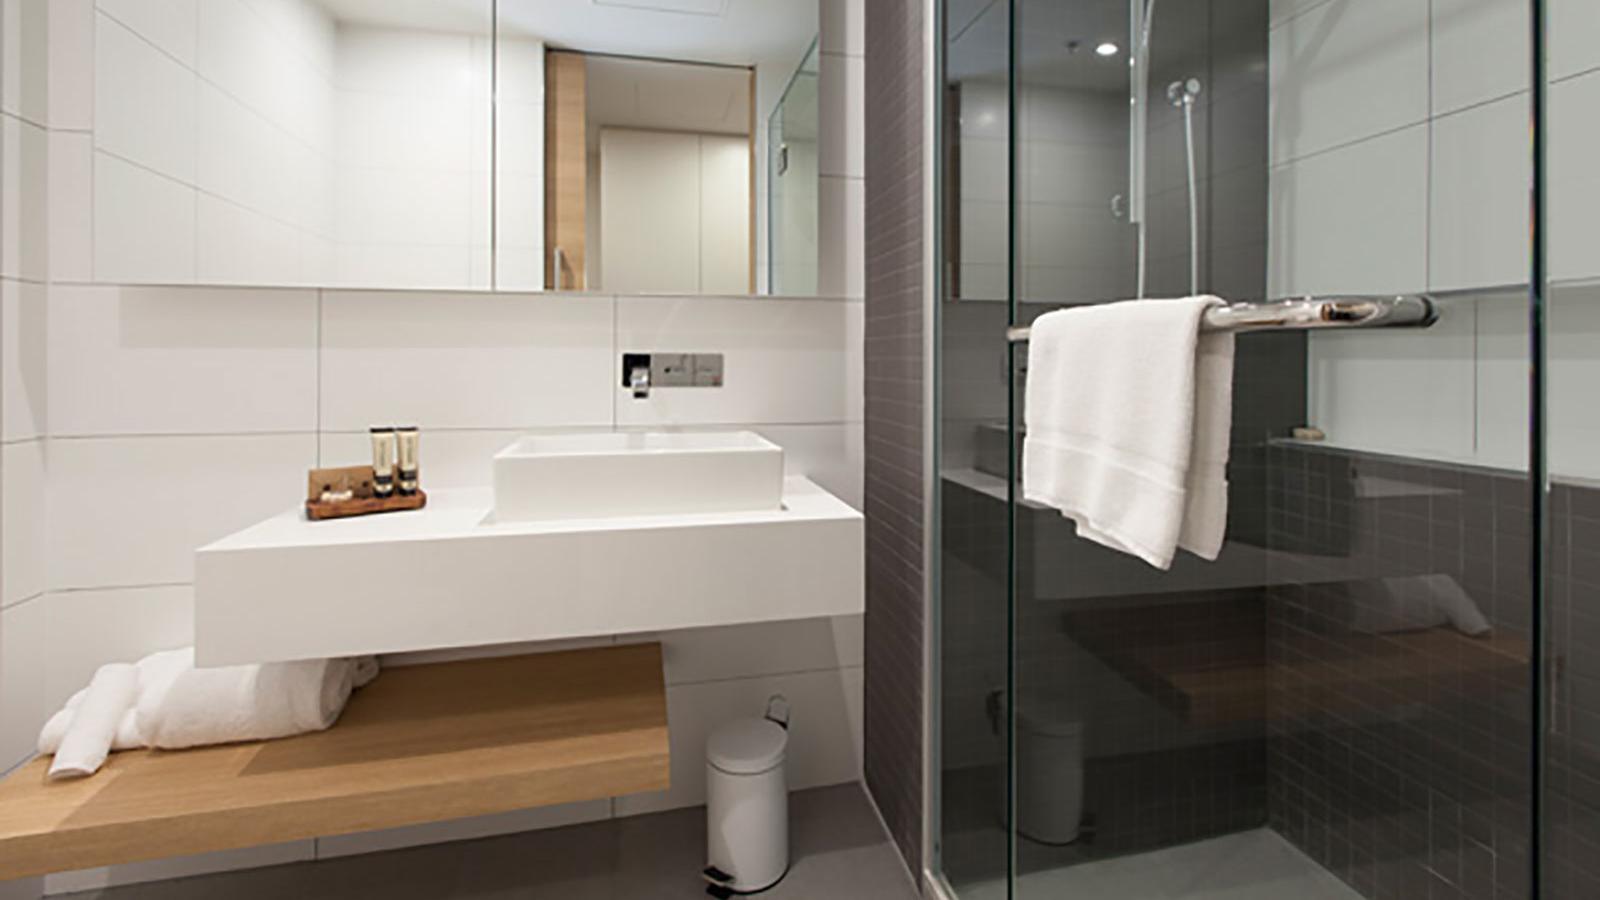 Bathroom of Courtyard View Room at Jasper Hotel Melbourne